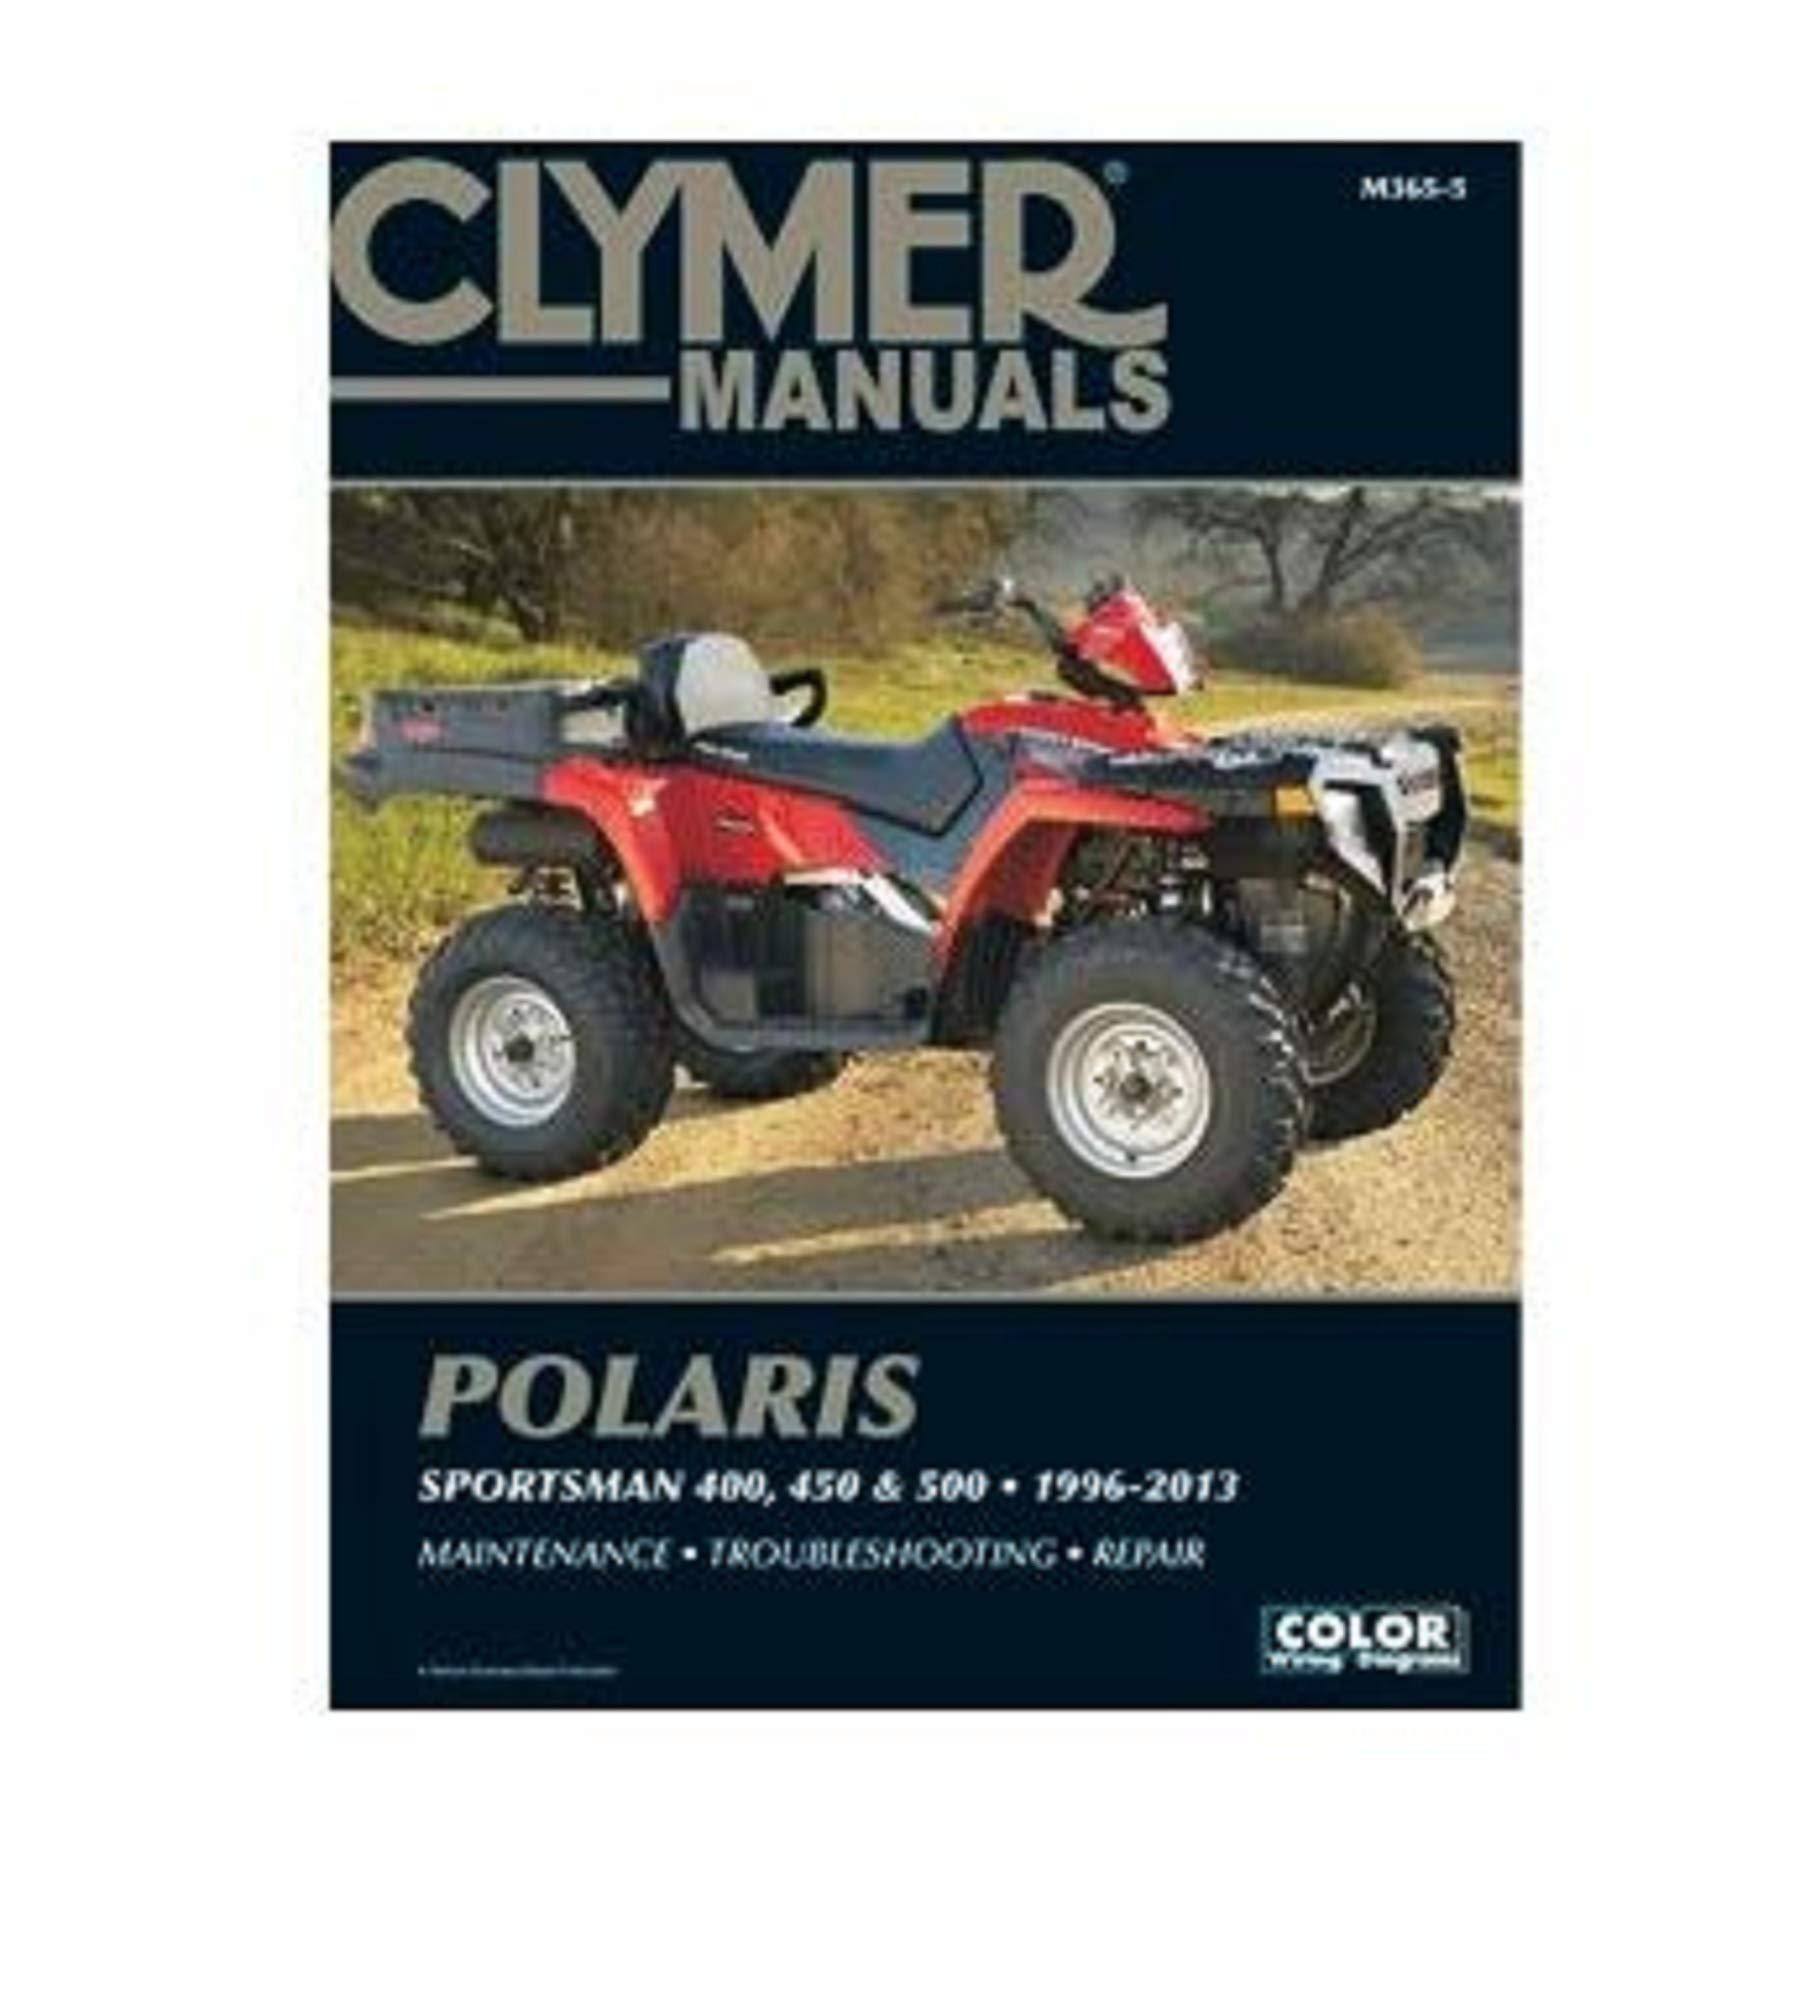 Polaris Sportsman 400 450 /& 500 1996-2013 Manual